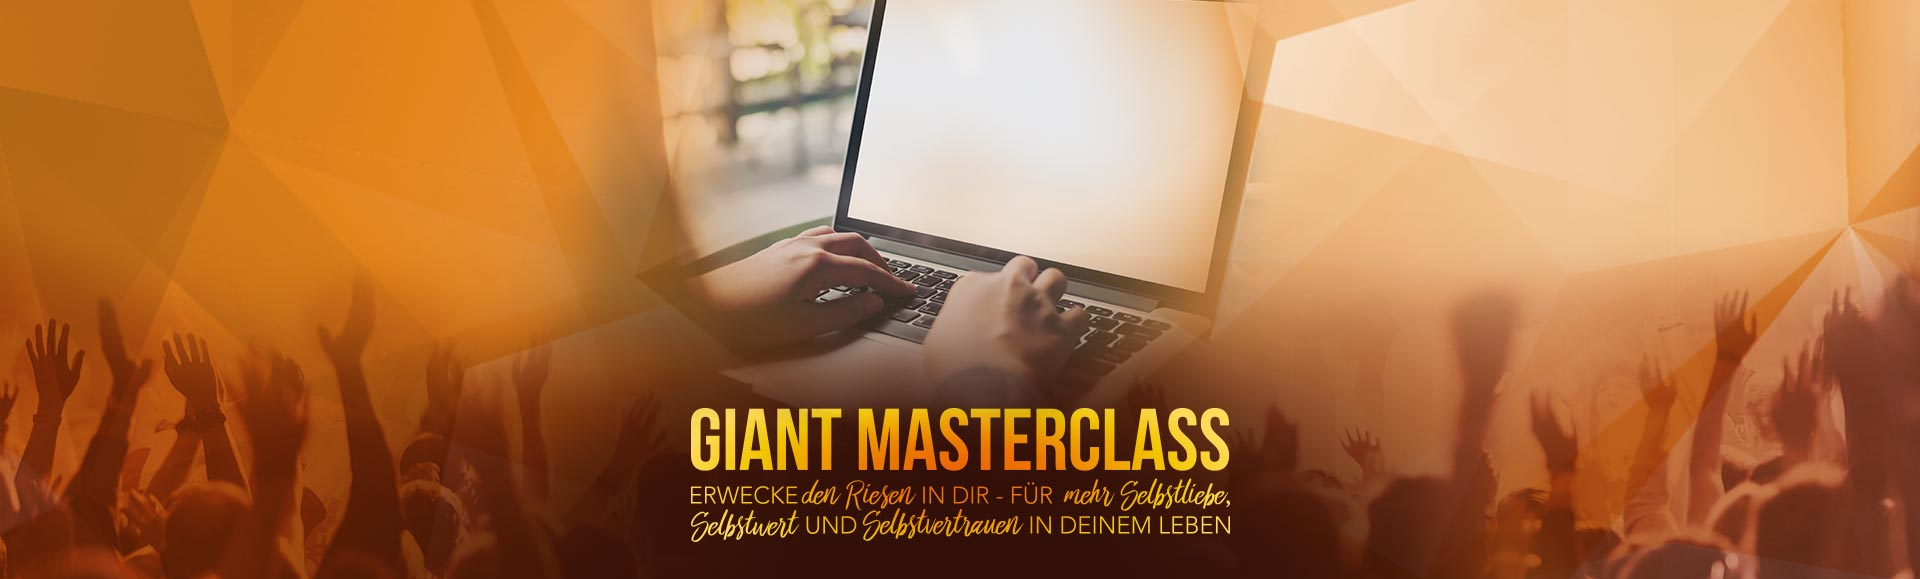 Giant-Masterclass_Live-Webinar_Damian-Richter-und-Valentin-scharf